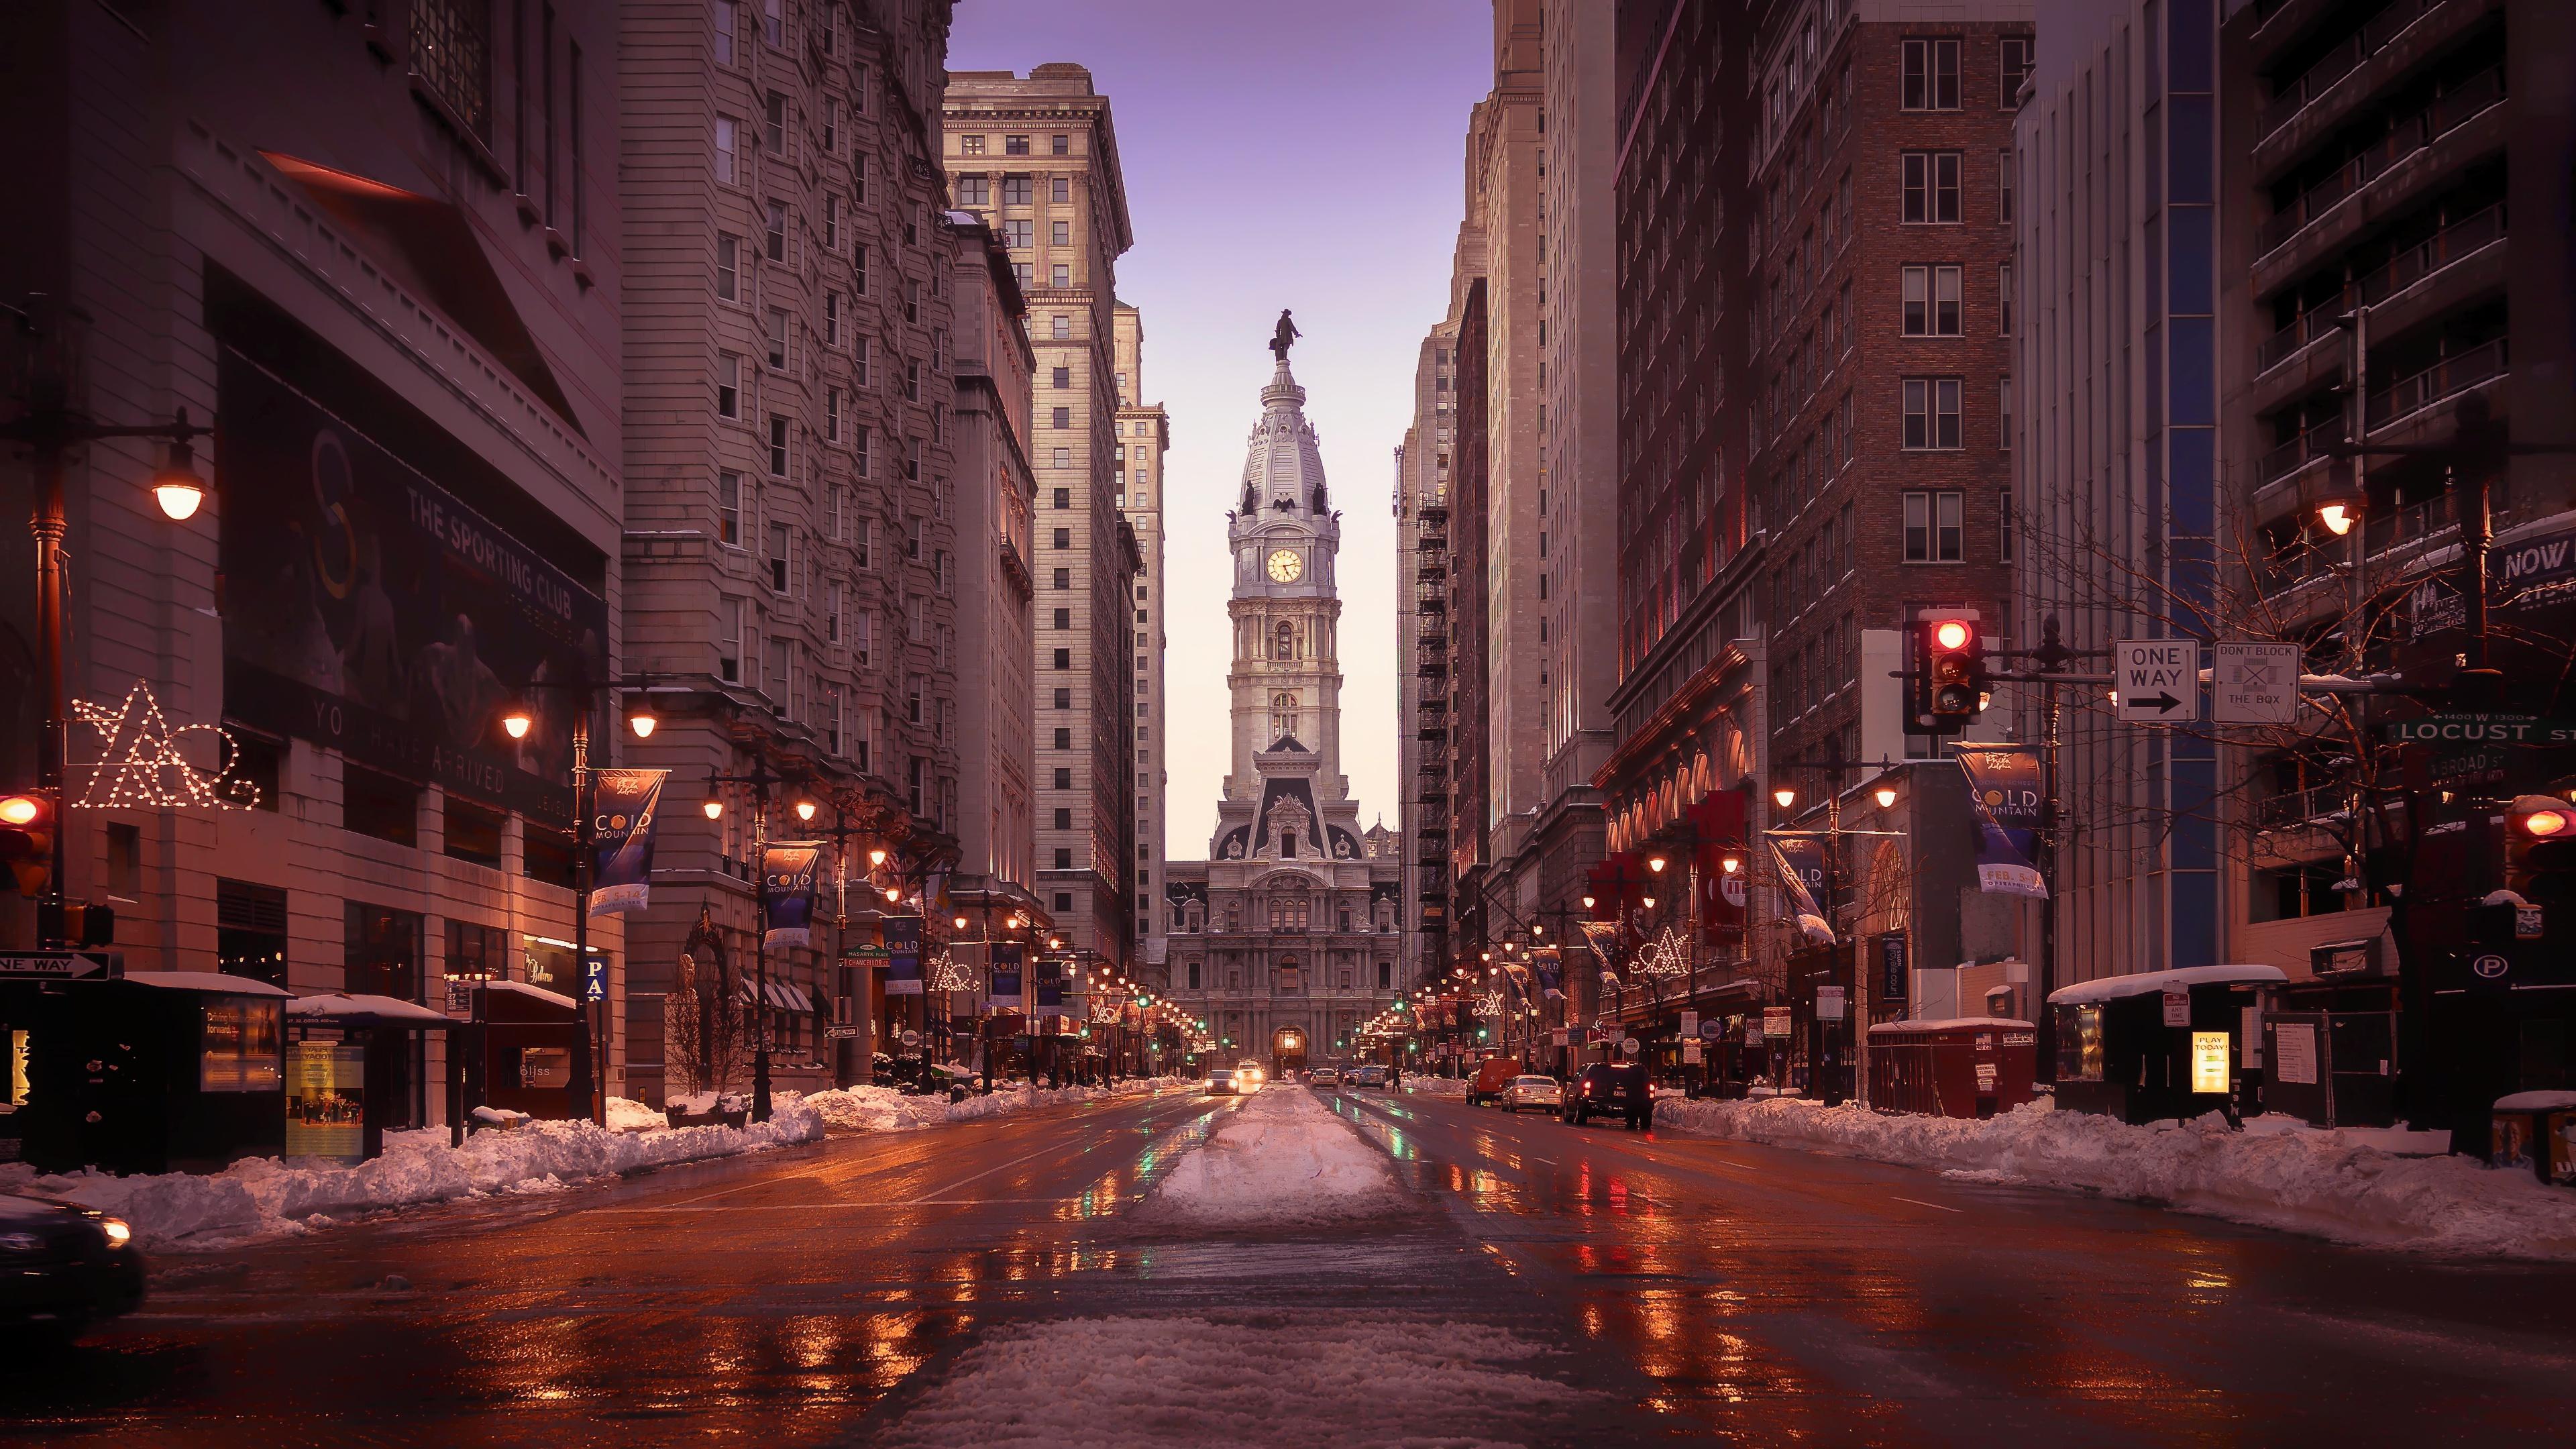 philadelphia streets tall buildings road snow 1538069539 - Philadelphia Streets Tall Buildings Road Snow - world wallpapers, street wallpapers, snow wallpapers, hd-wallpapers, buildings wallpapers, 4k-wallpapers